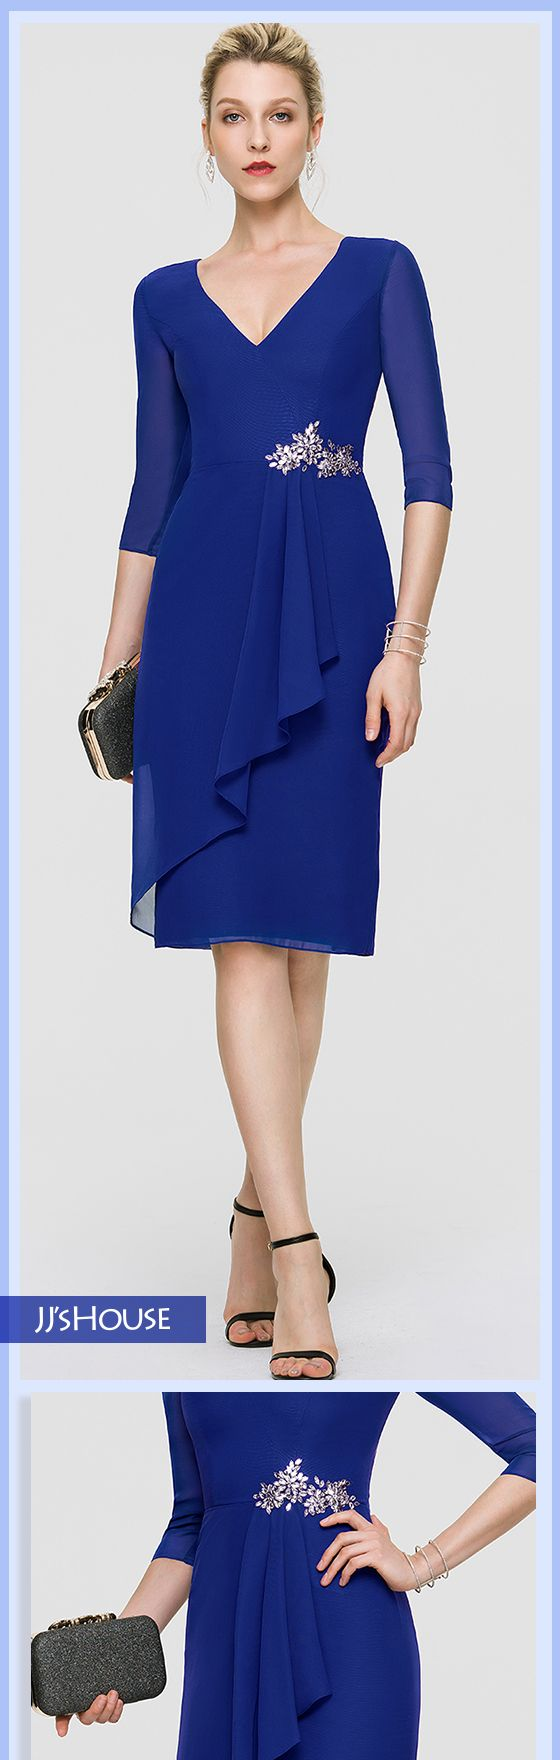 JJsHouse Sheath/Column V-neck Knee-Length Chiffon Cocktail Dress With Beading Sequins